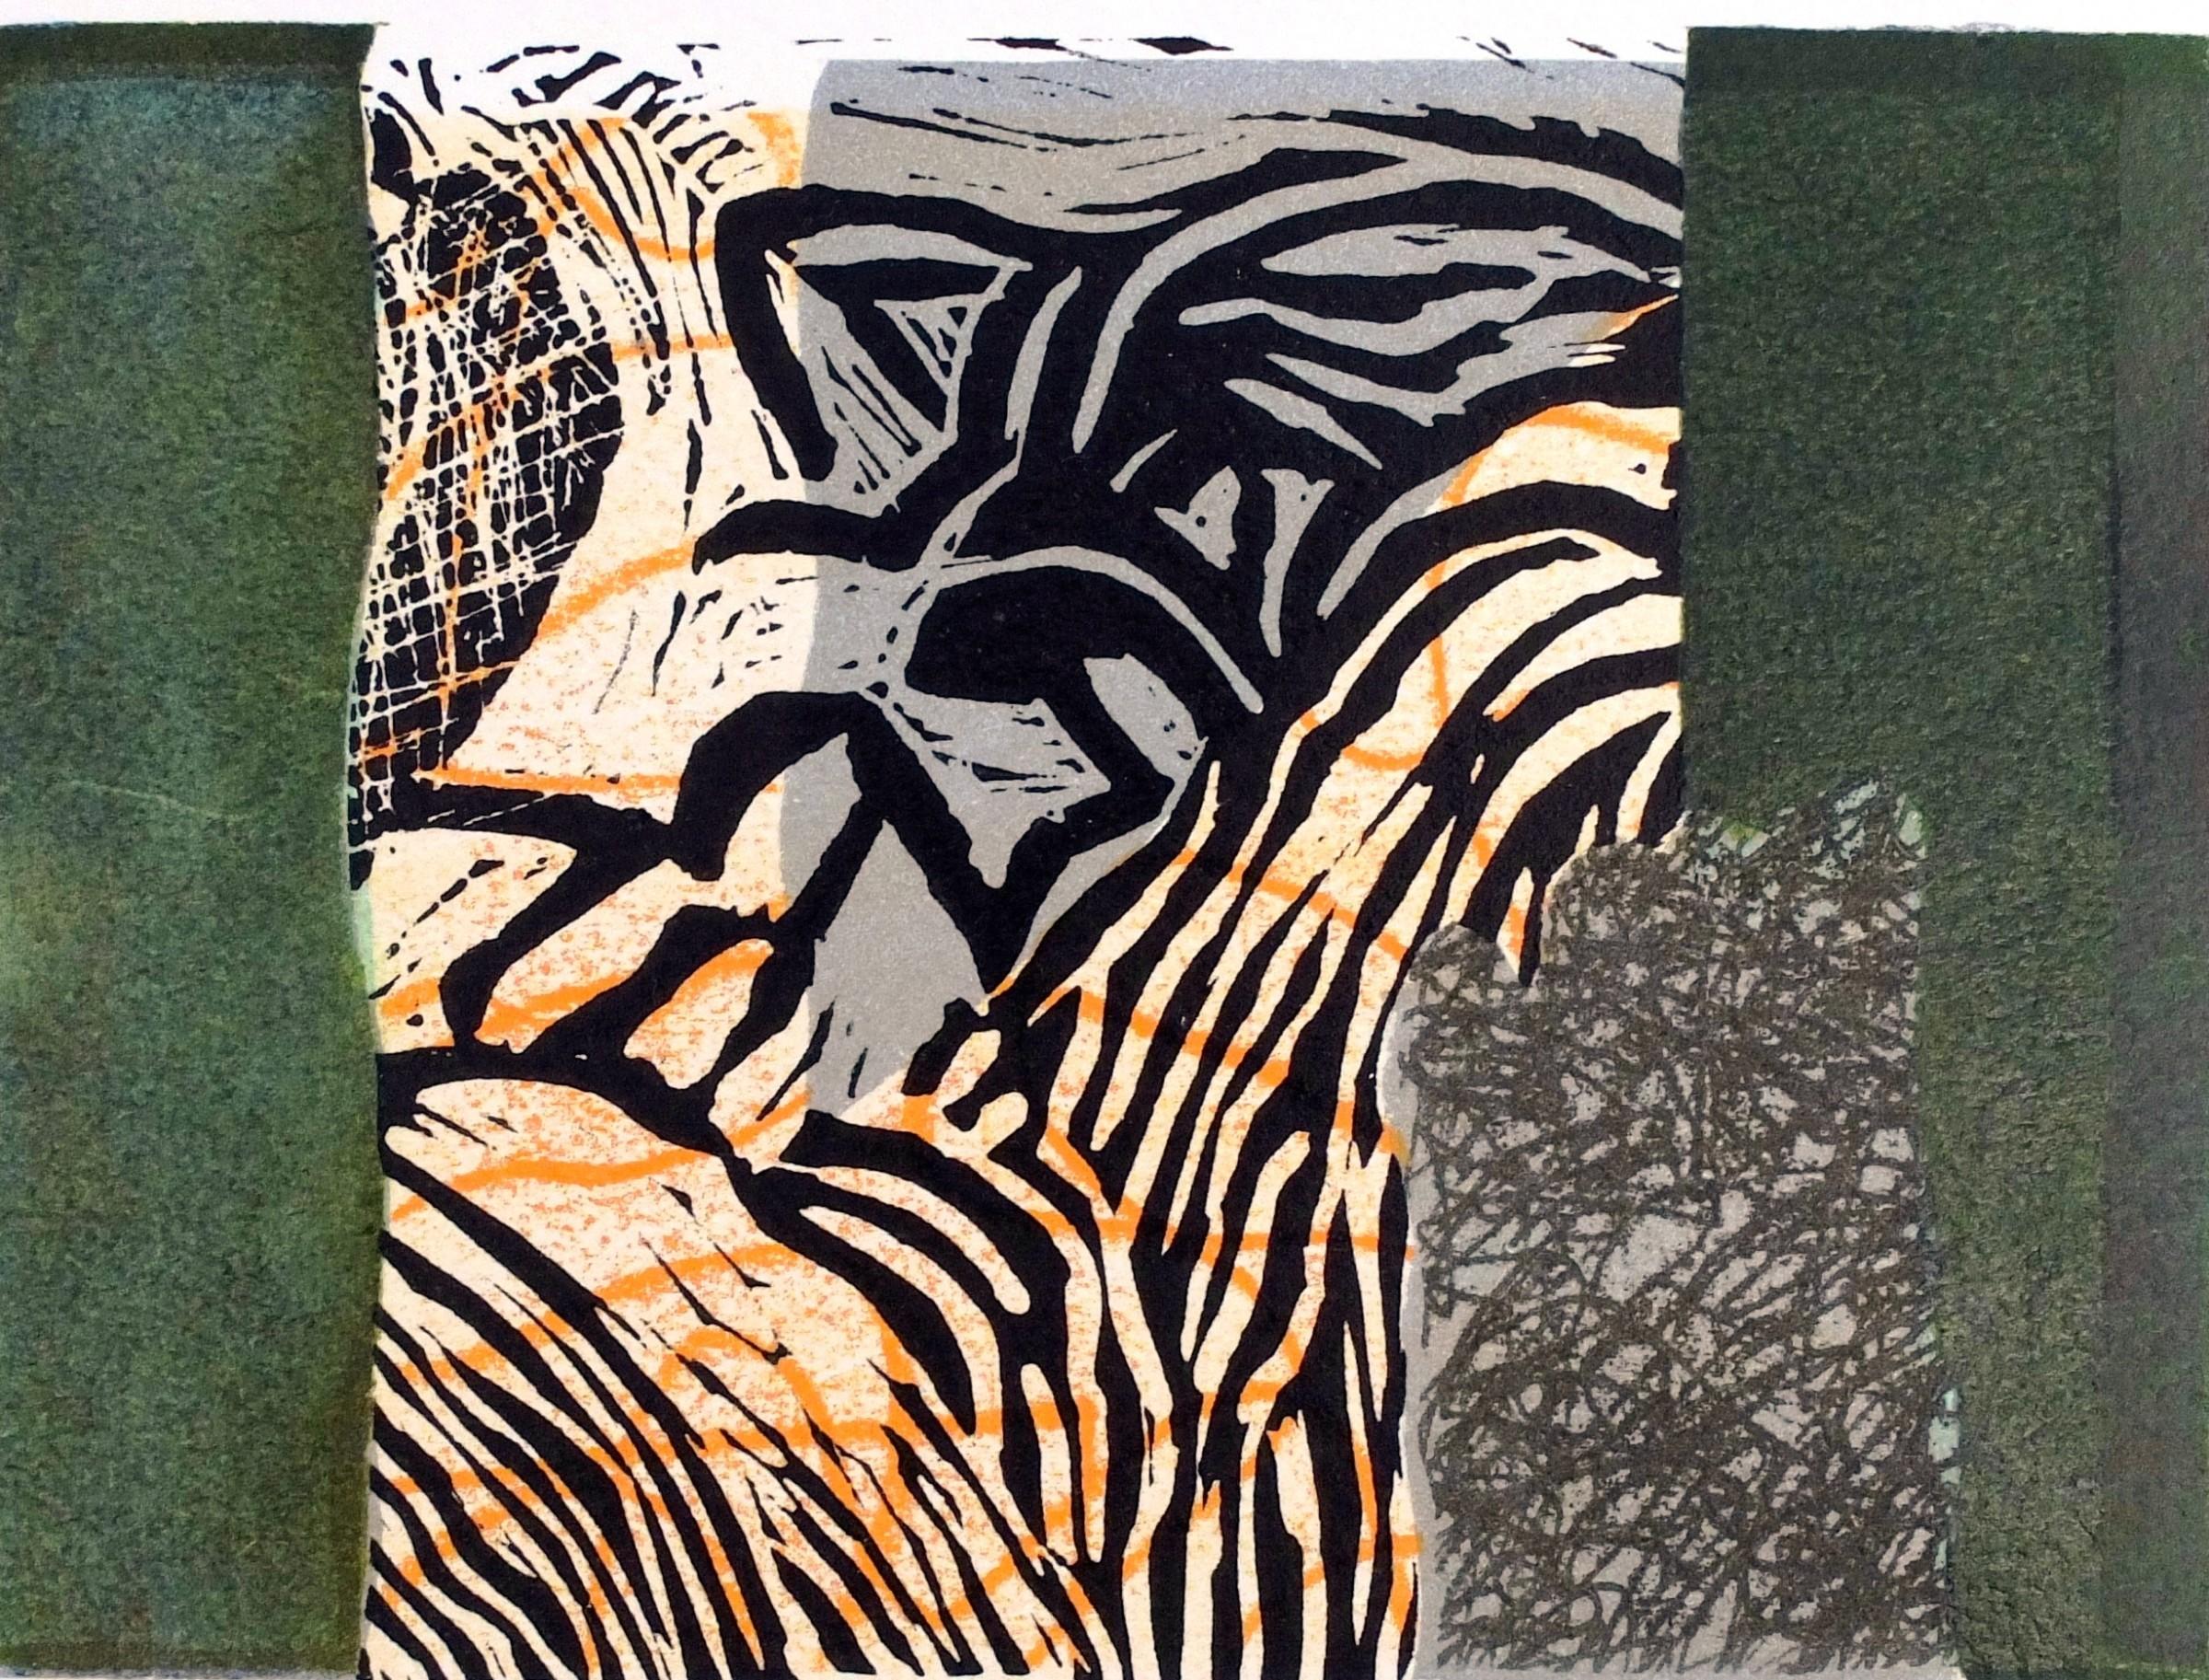 <span class=&#34;link fancybox-details-link&#34;><a href=&#34;/artists/32-robert-baggaley-re/works/9801/&#34;>View Detail Page</a></span><div class=&#34;artist&#34;><span class=&#34;artist&#34;><strong>Robert Baggaley RE</strong></span></div><div class=&#34;title&#34;><em>Composition 2</em></div><div class=&#34;medium&#34;>monotype </div>